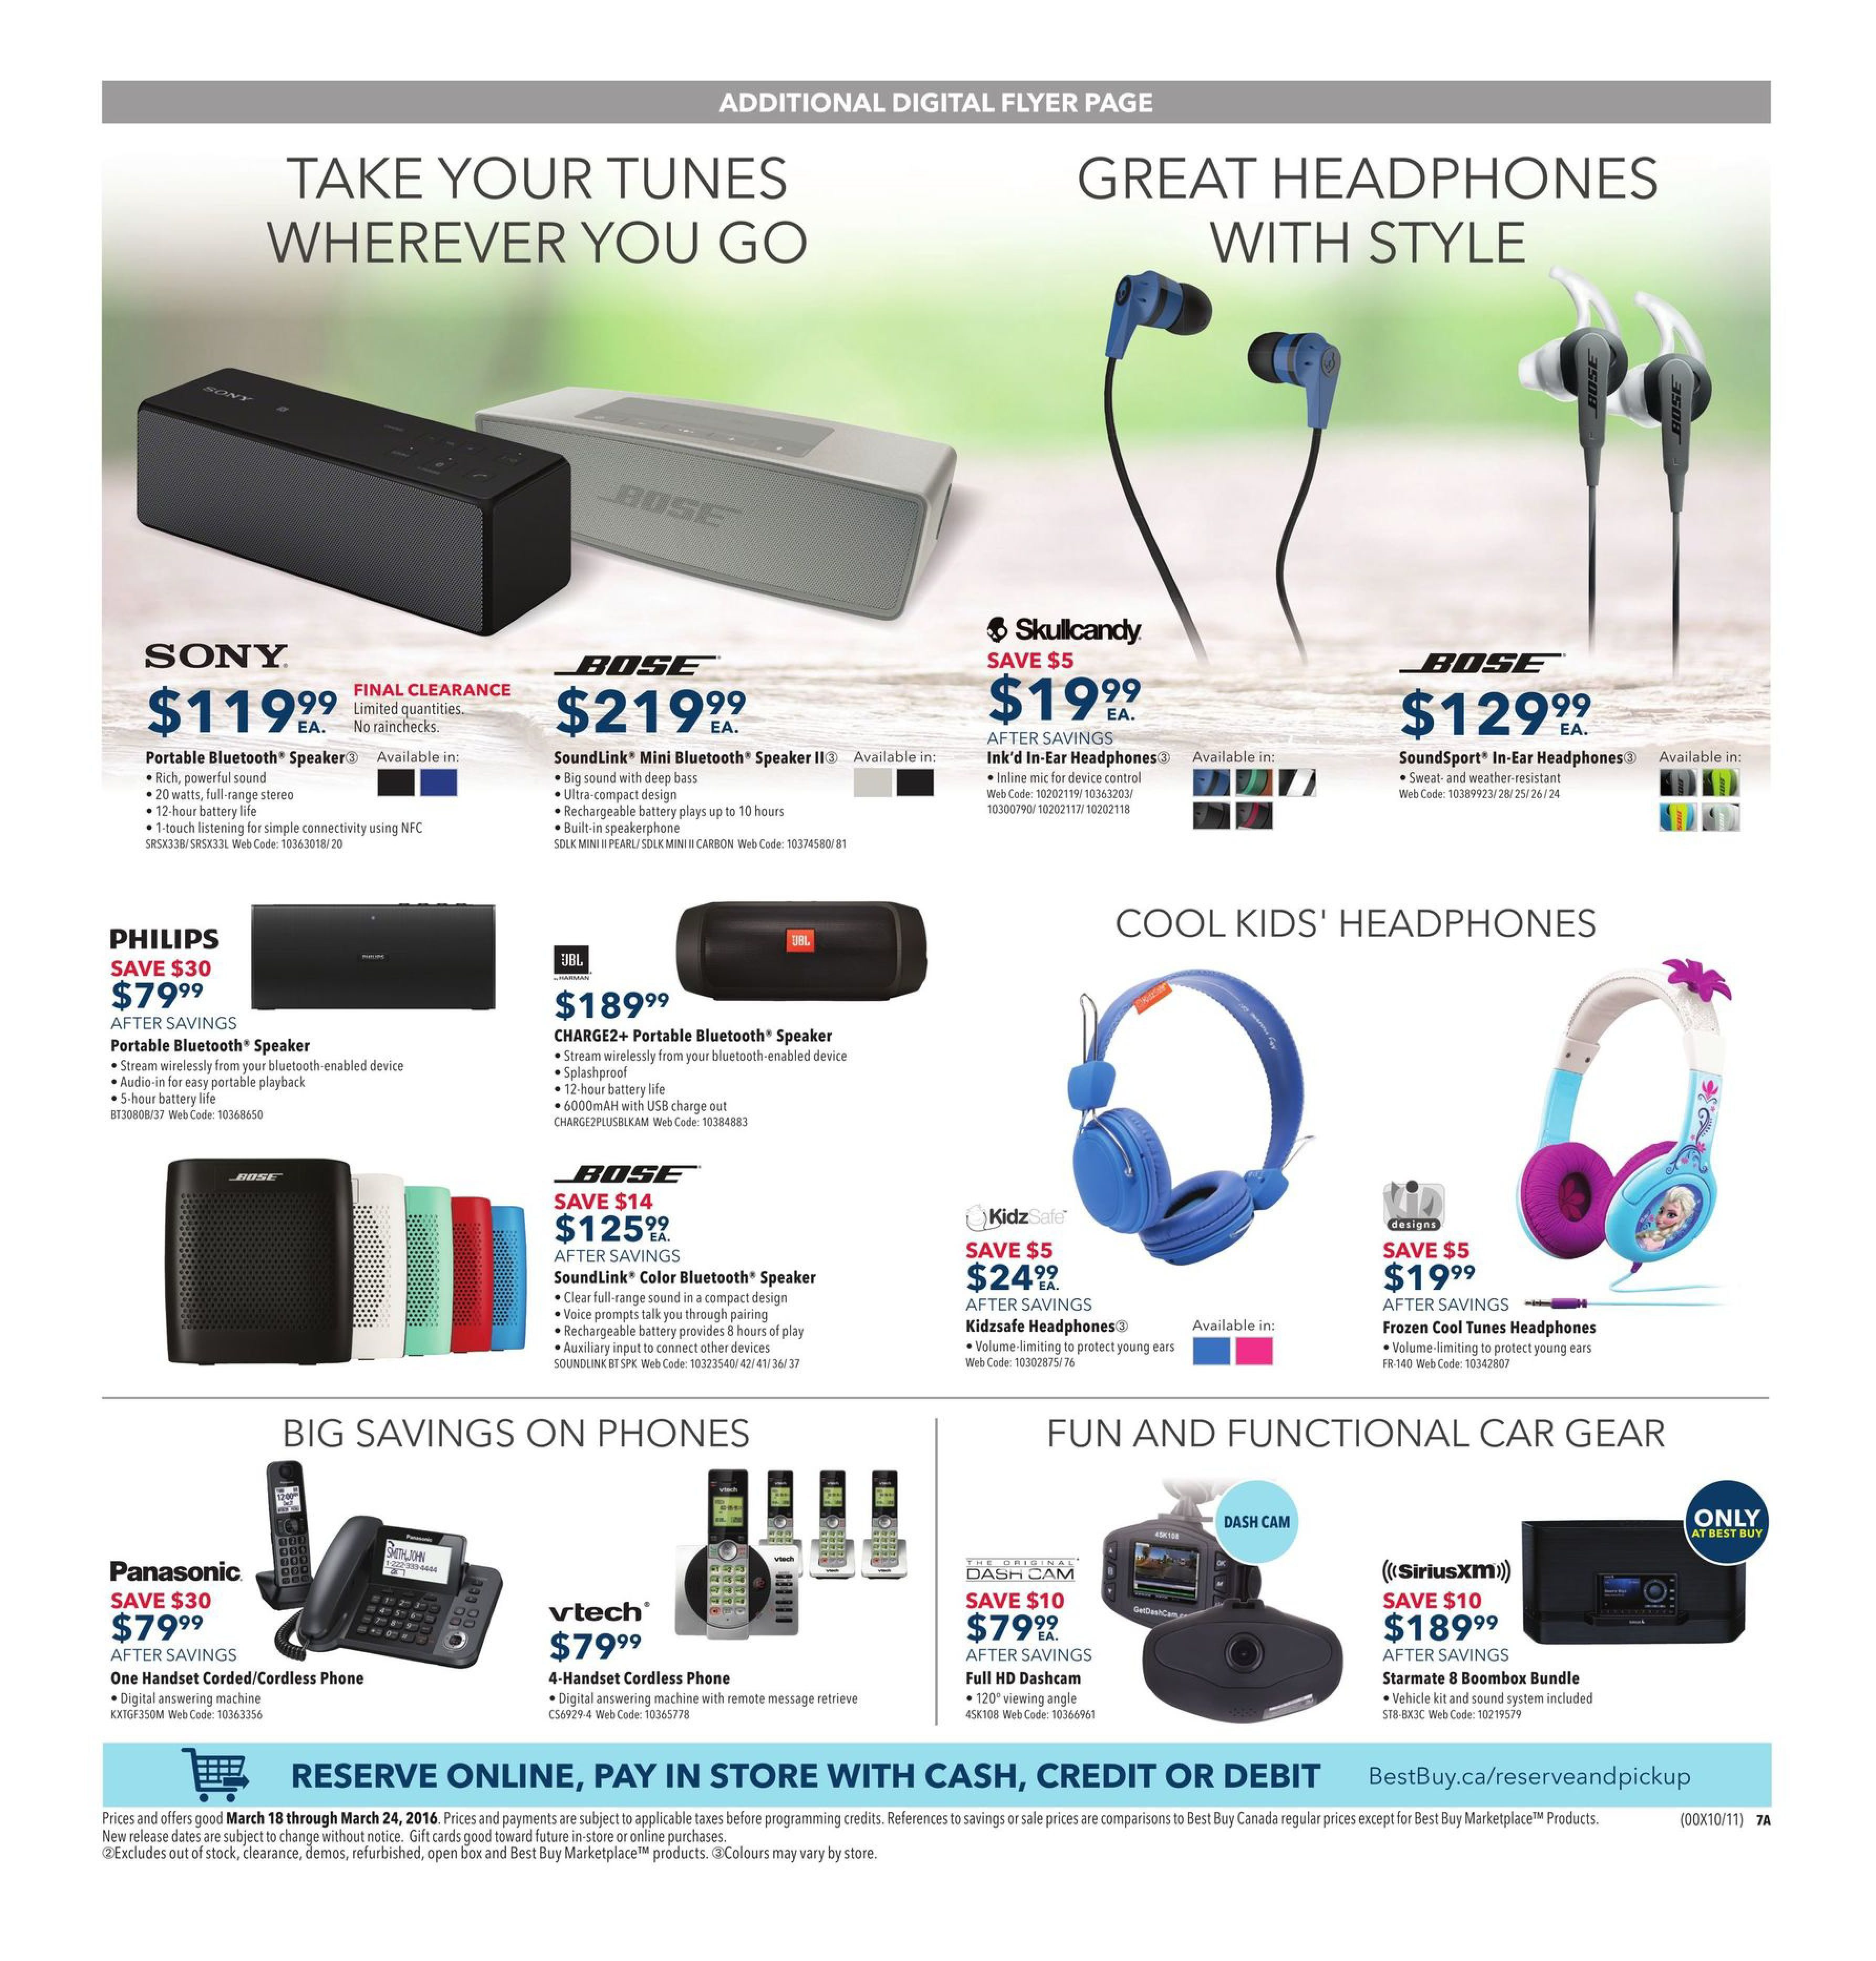 Best Buy Weekly Flyer Smart Spring Savings Mar 18 24 Paket Access Control Fingerprint X6 Door Lock